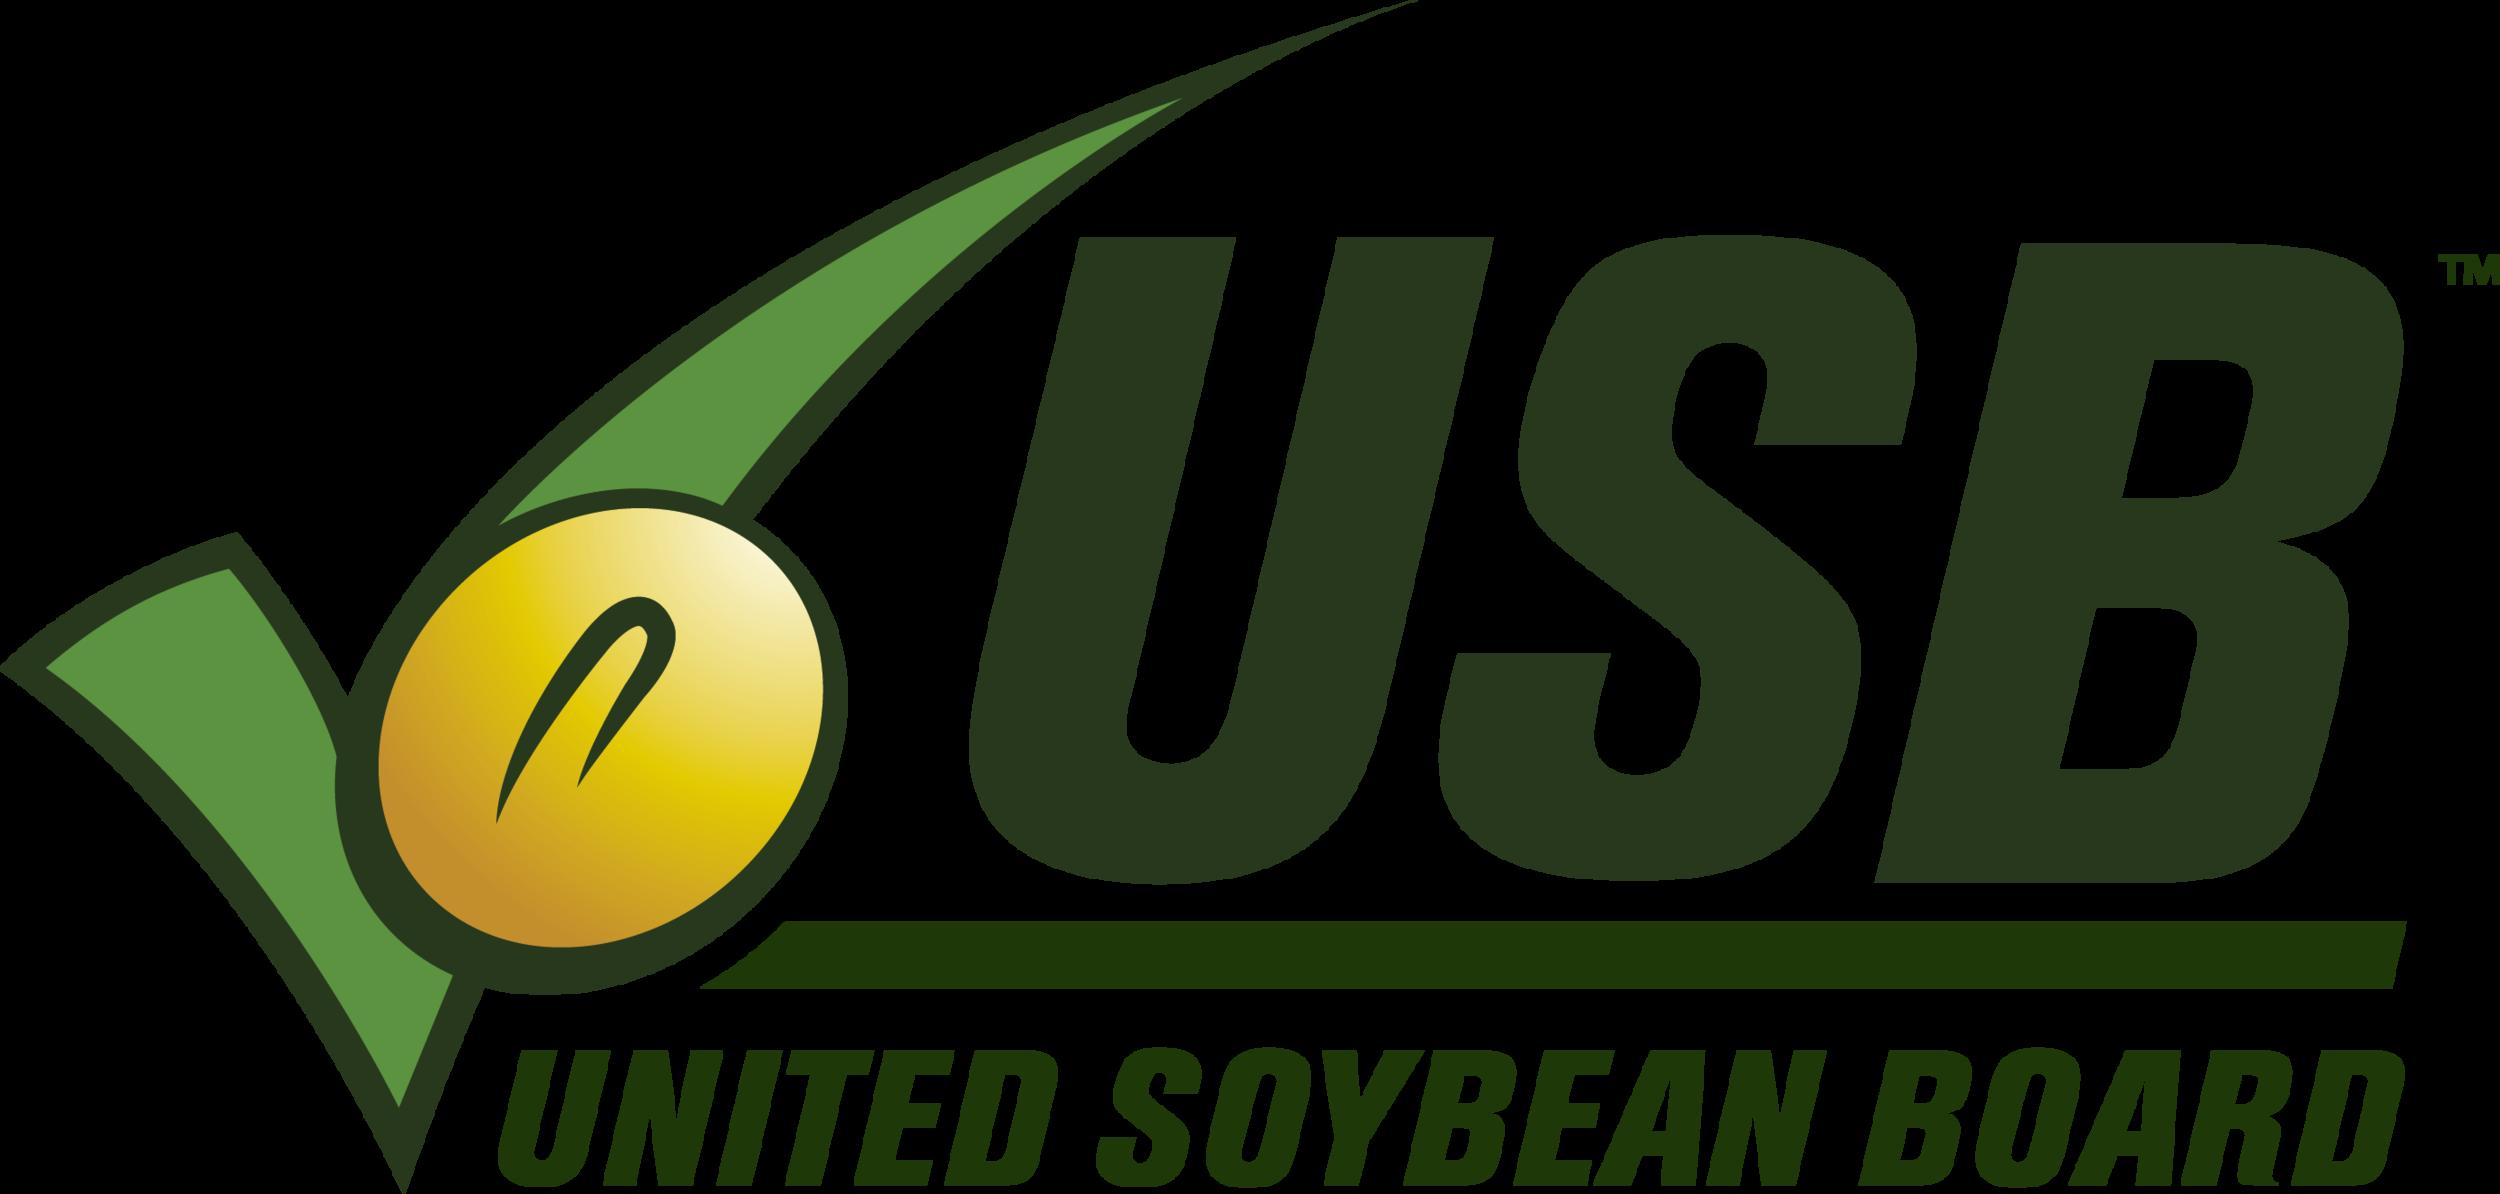 USB_logo.png